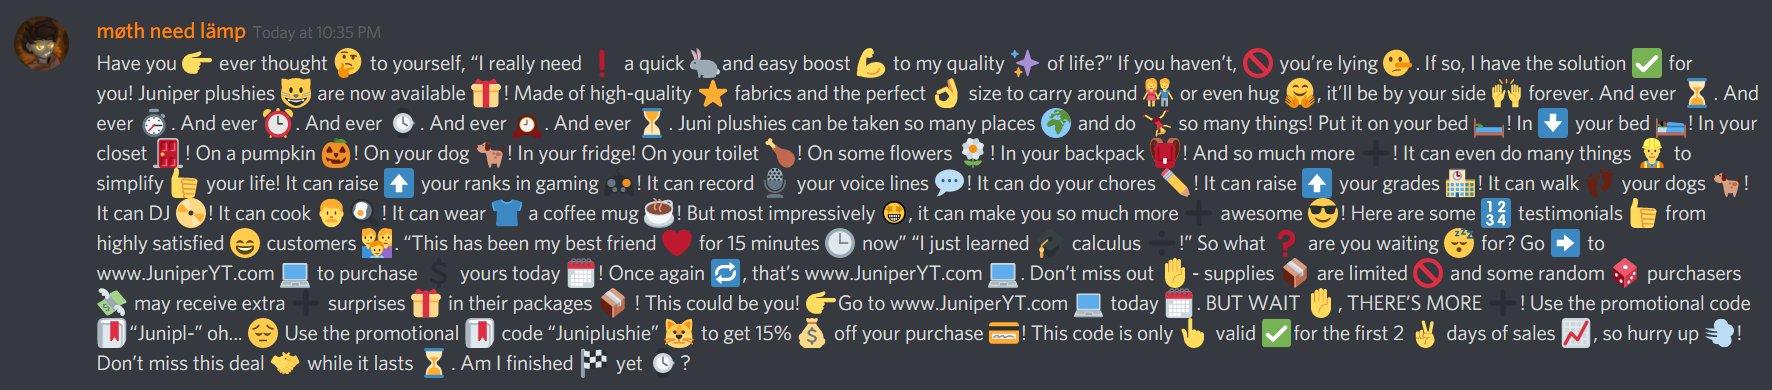 Thinking emoji copypasta